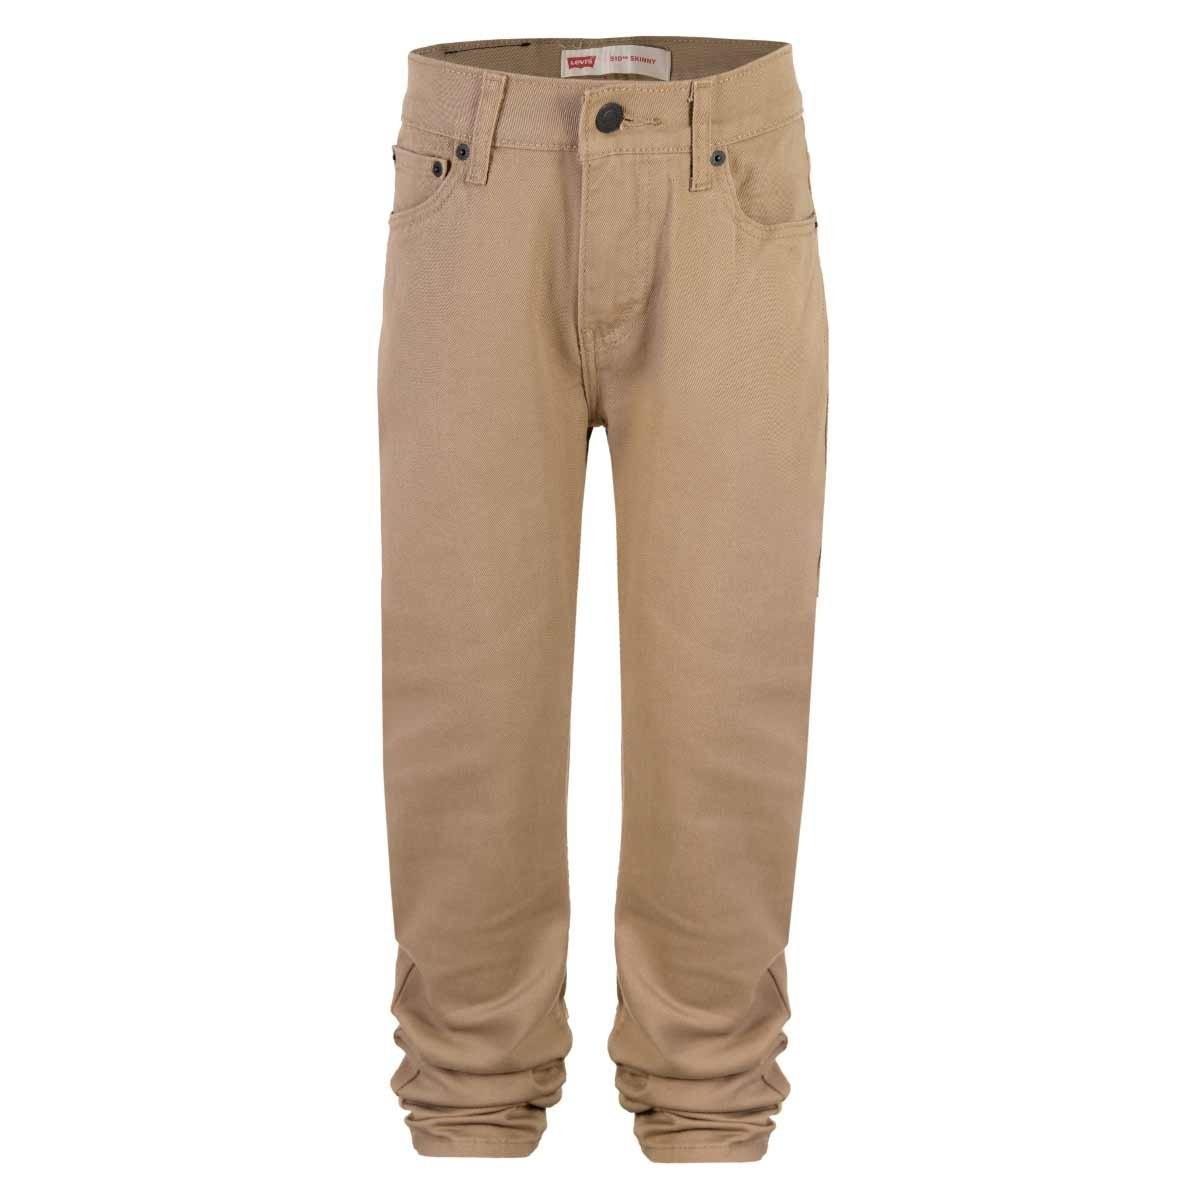 Jeans Skinny Levi's Boys